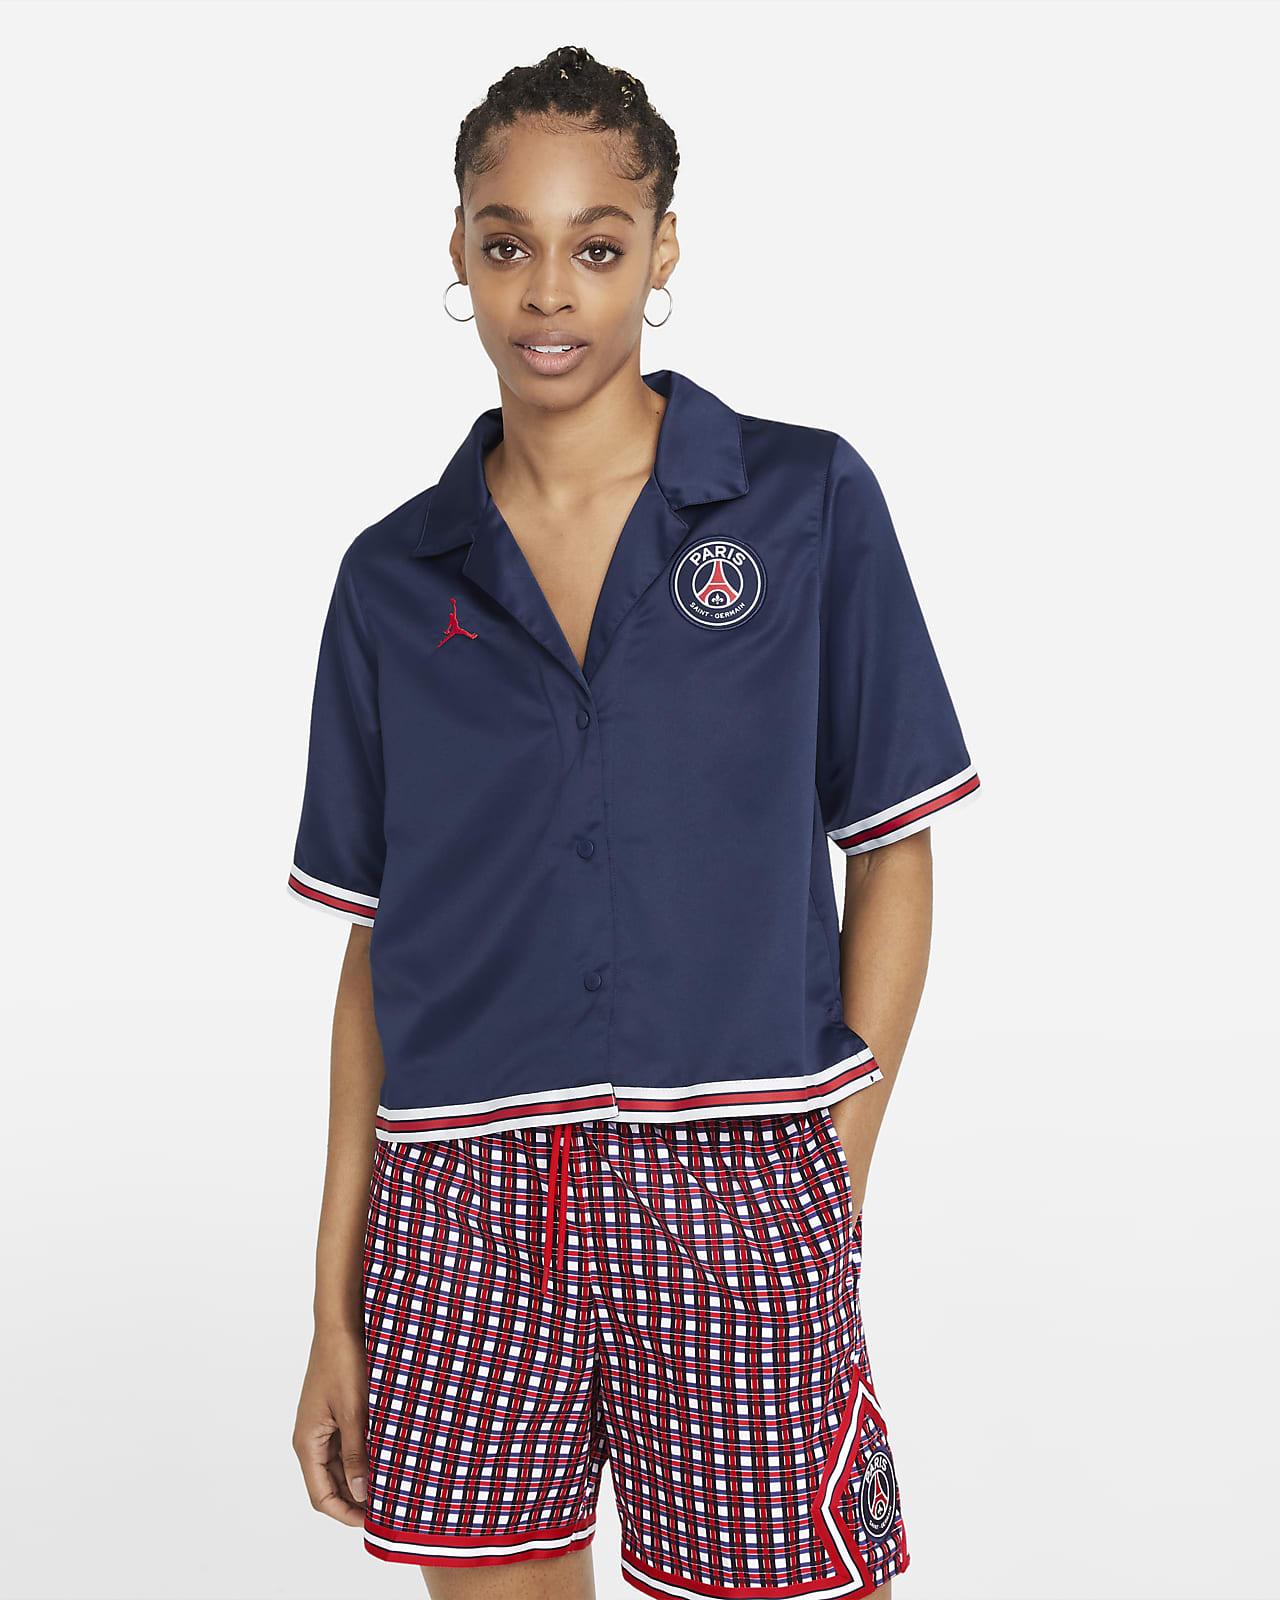 Damska koszulka piłkarska z krótkim rękawem Paris Saint-Germain